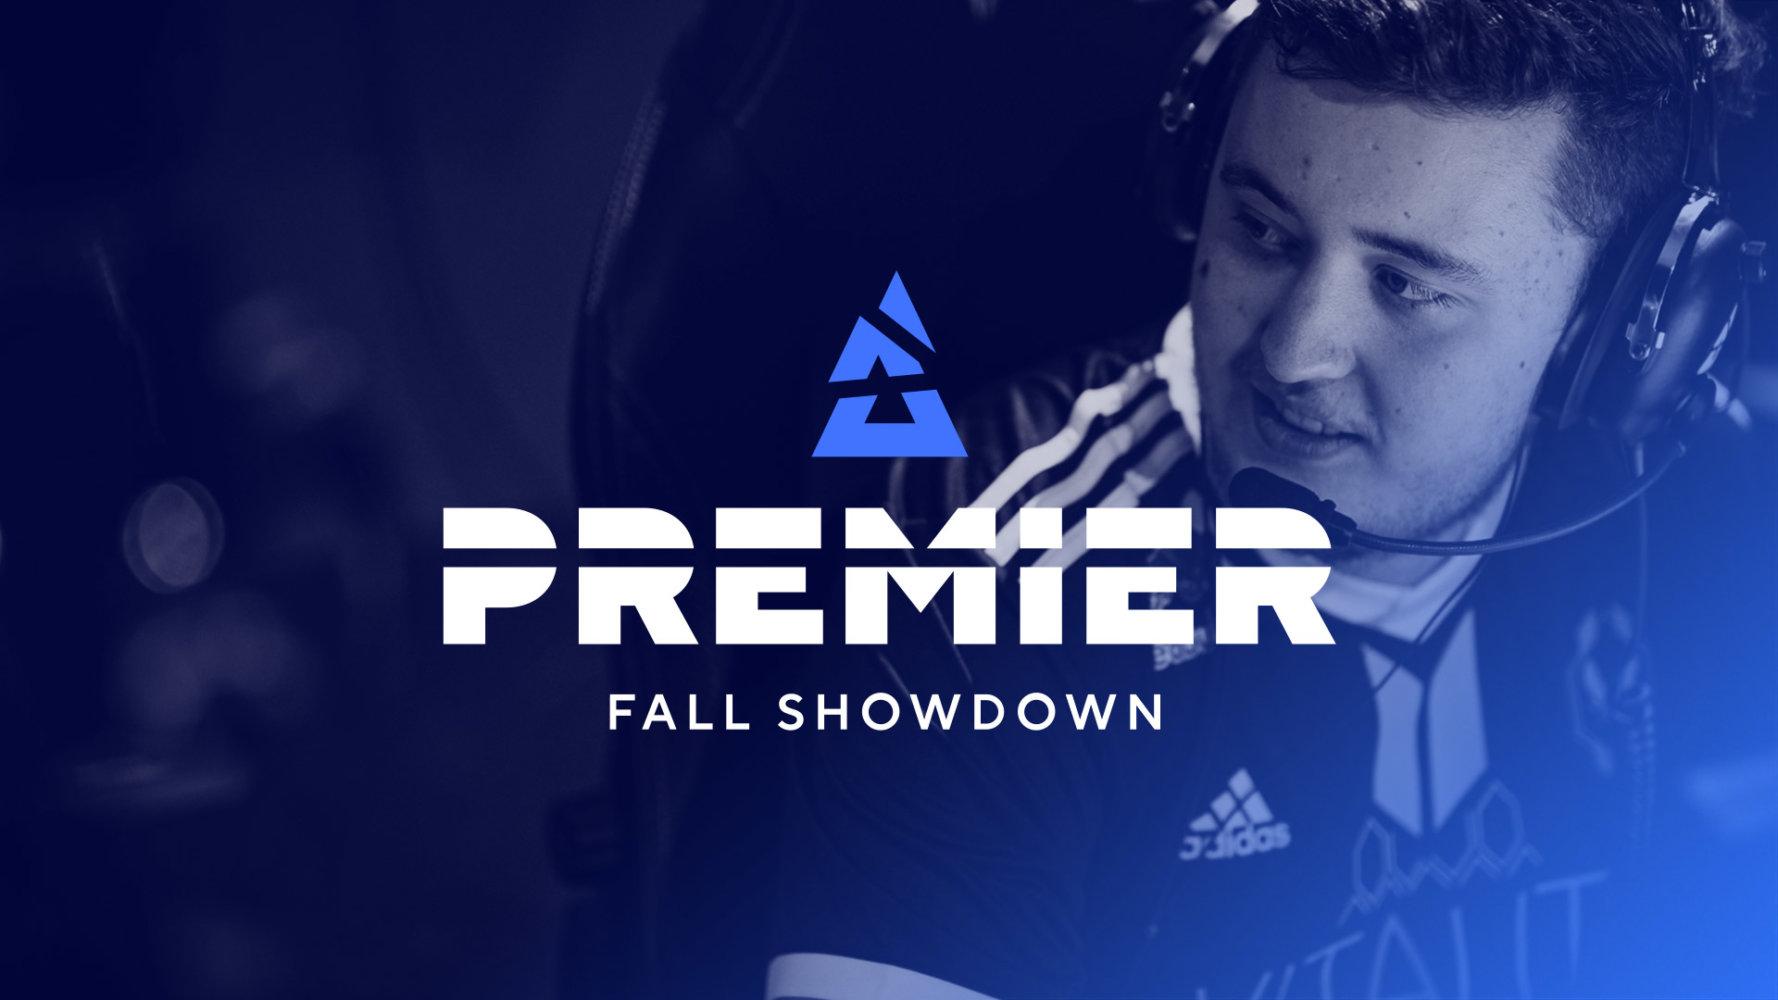 blast premier fall showdown 2020